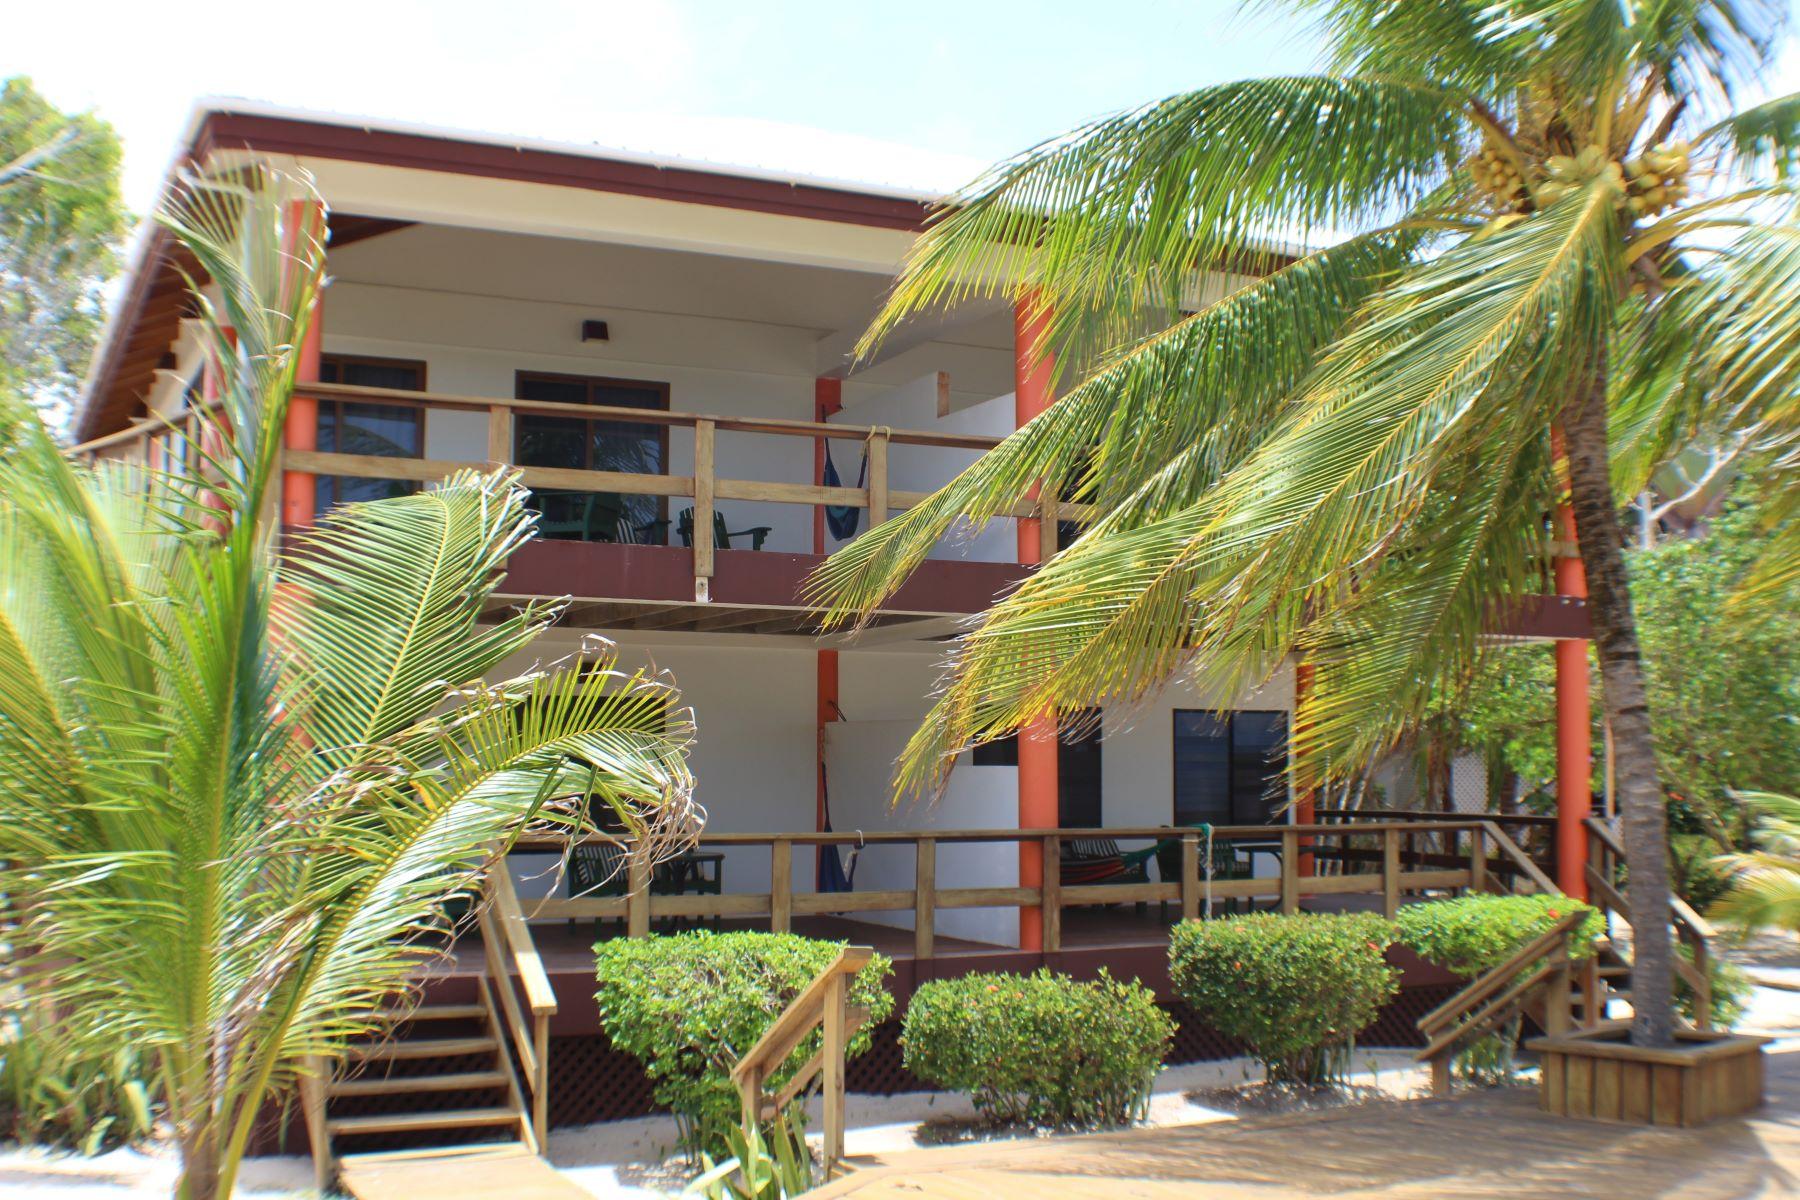 Condominium for Sale at Roberts Grove 1BR Condo Placencia, Stann Creek, Belize